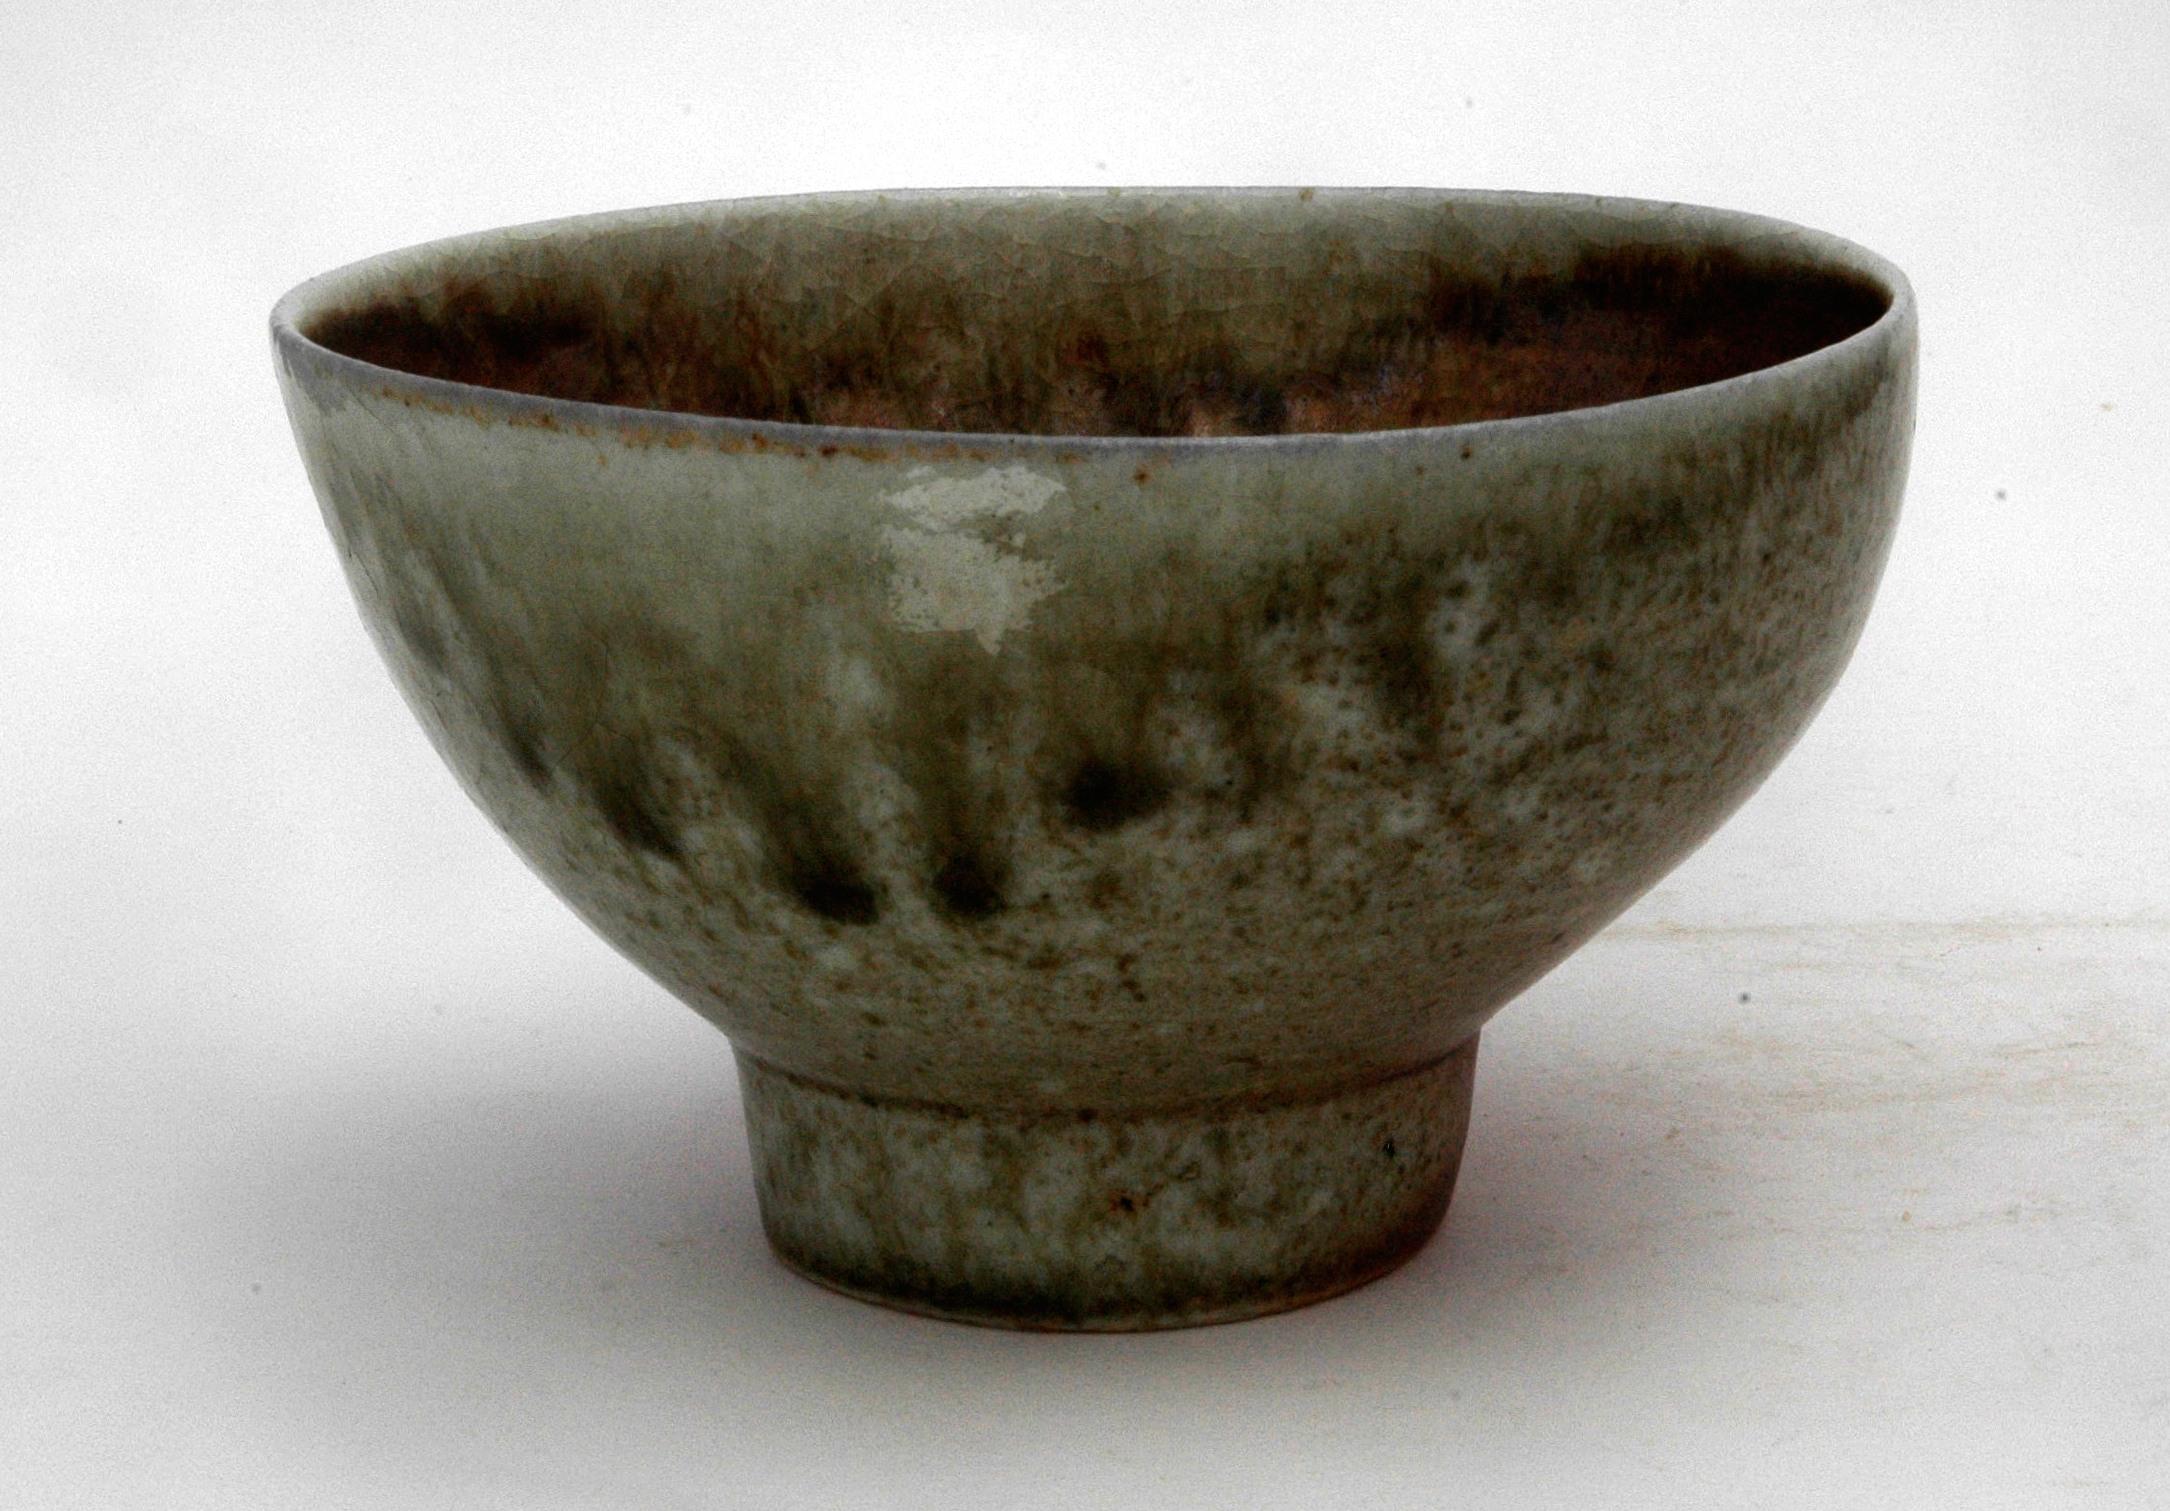 Steve Harrison, Virtue, ceramic bowl, dimensions variable. Image courtesy the artist.